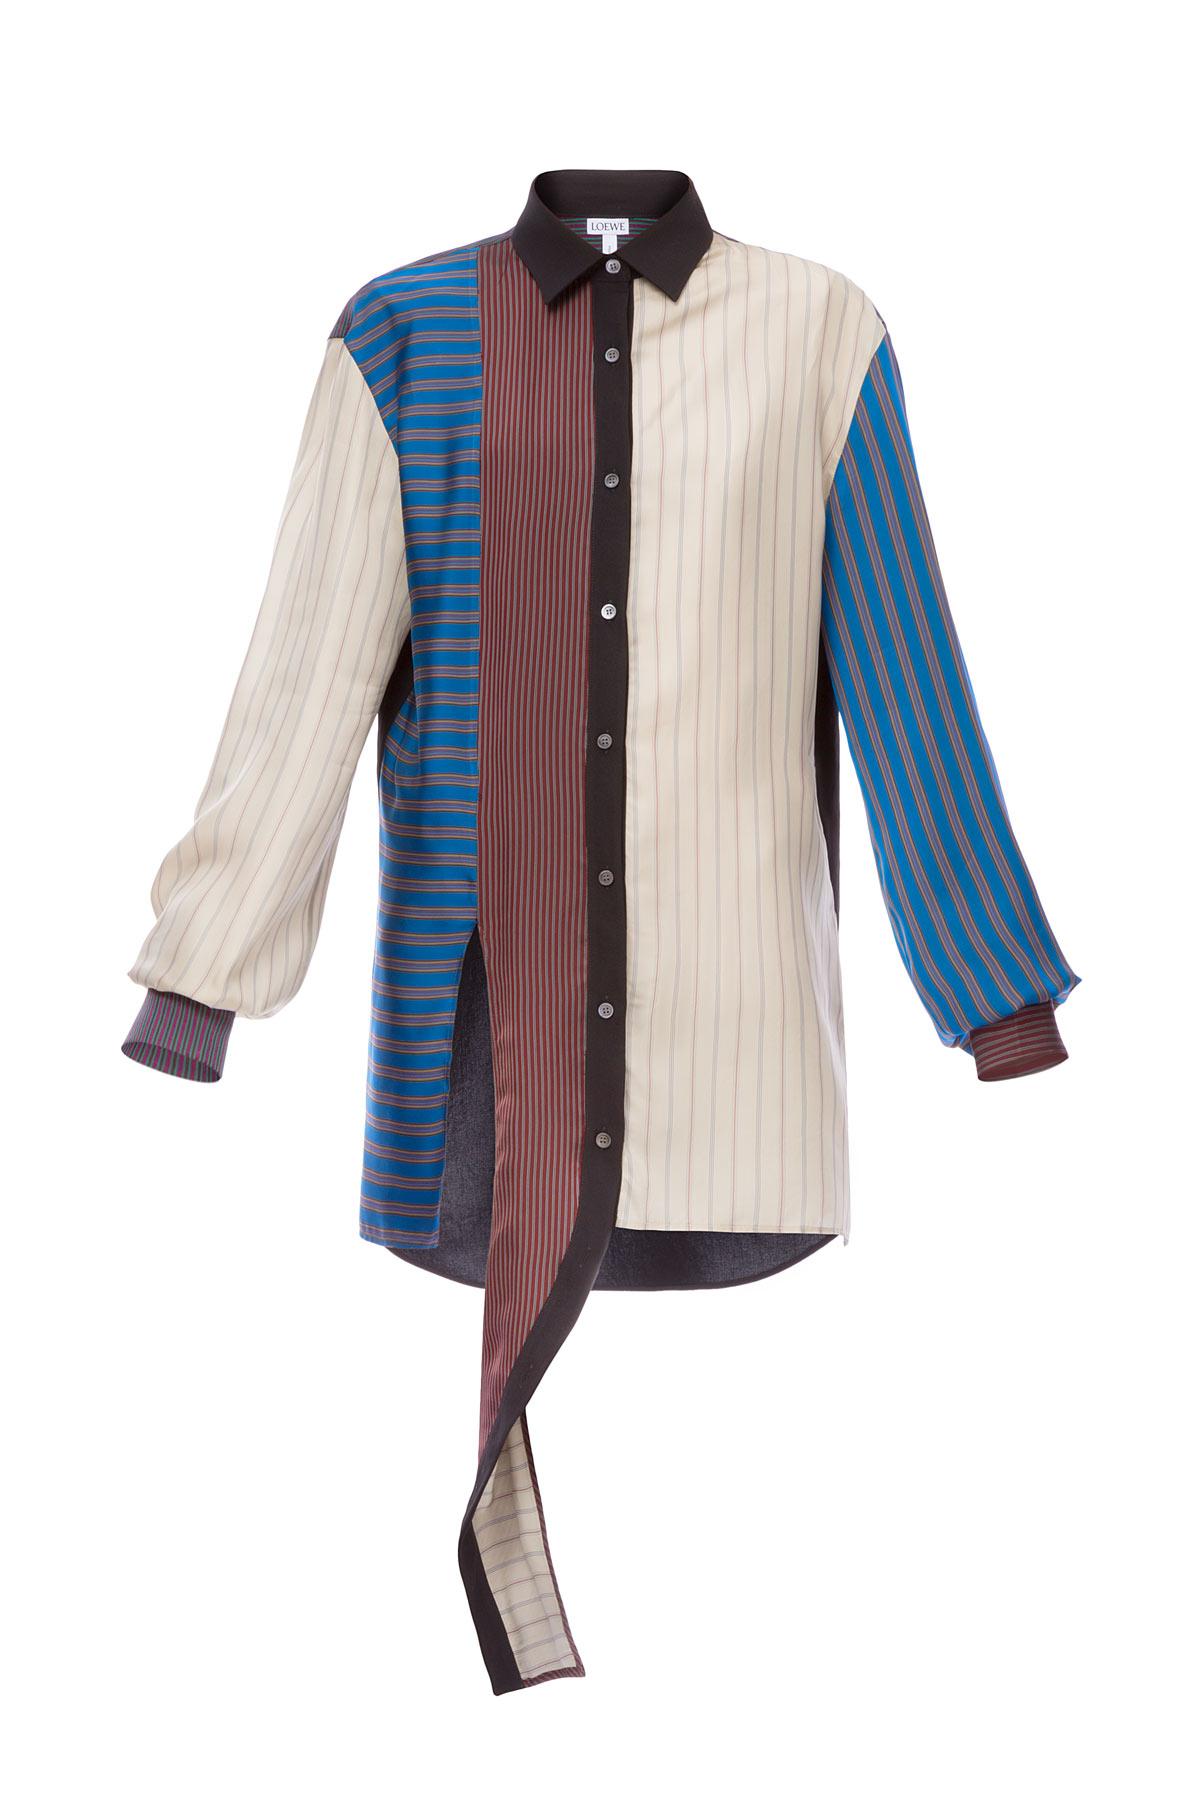 LOEWE Patchwork Stripe Shirt Multicolor front